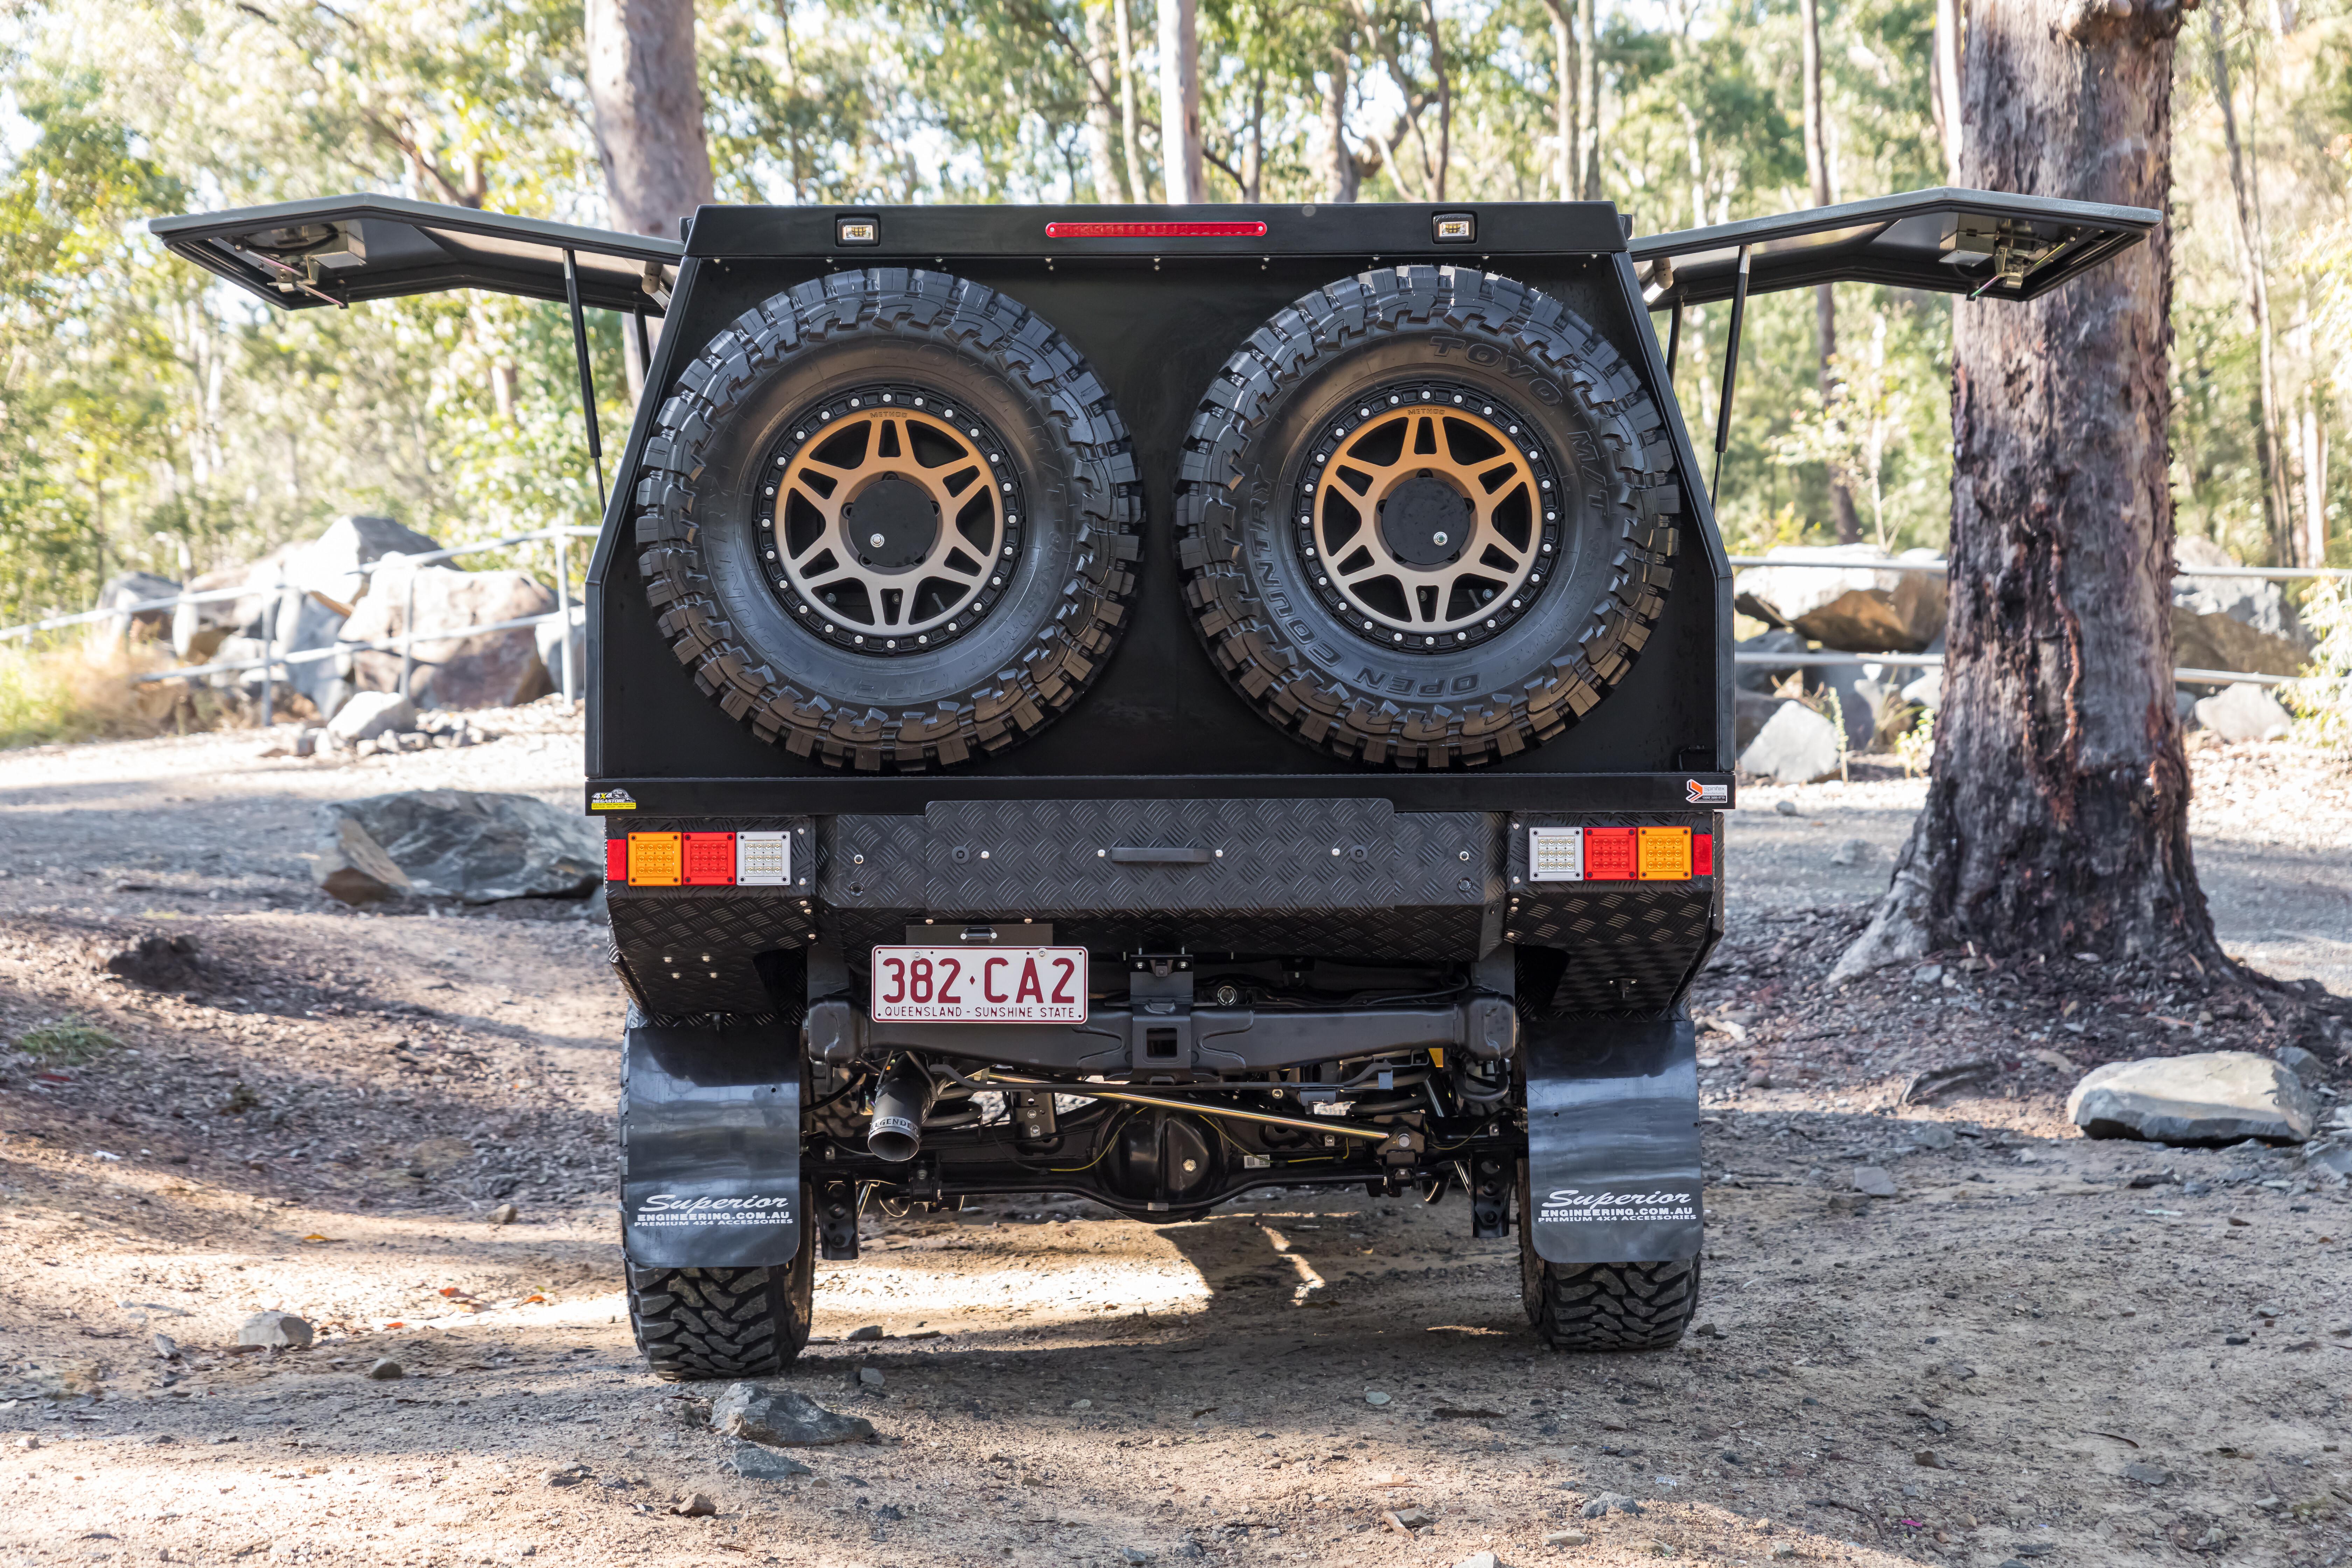 4 X 4 Australia Reviews 2021 September 2021 Rambler Vehicles Toyota Land Cruiser 200 Series 21